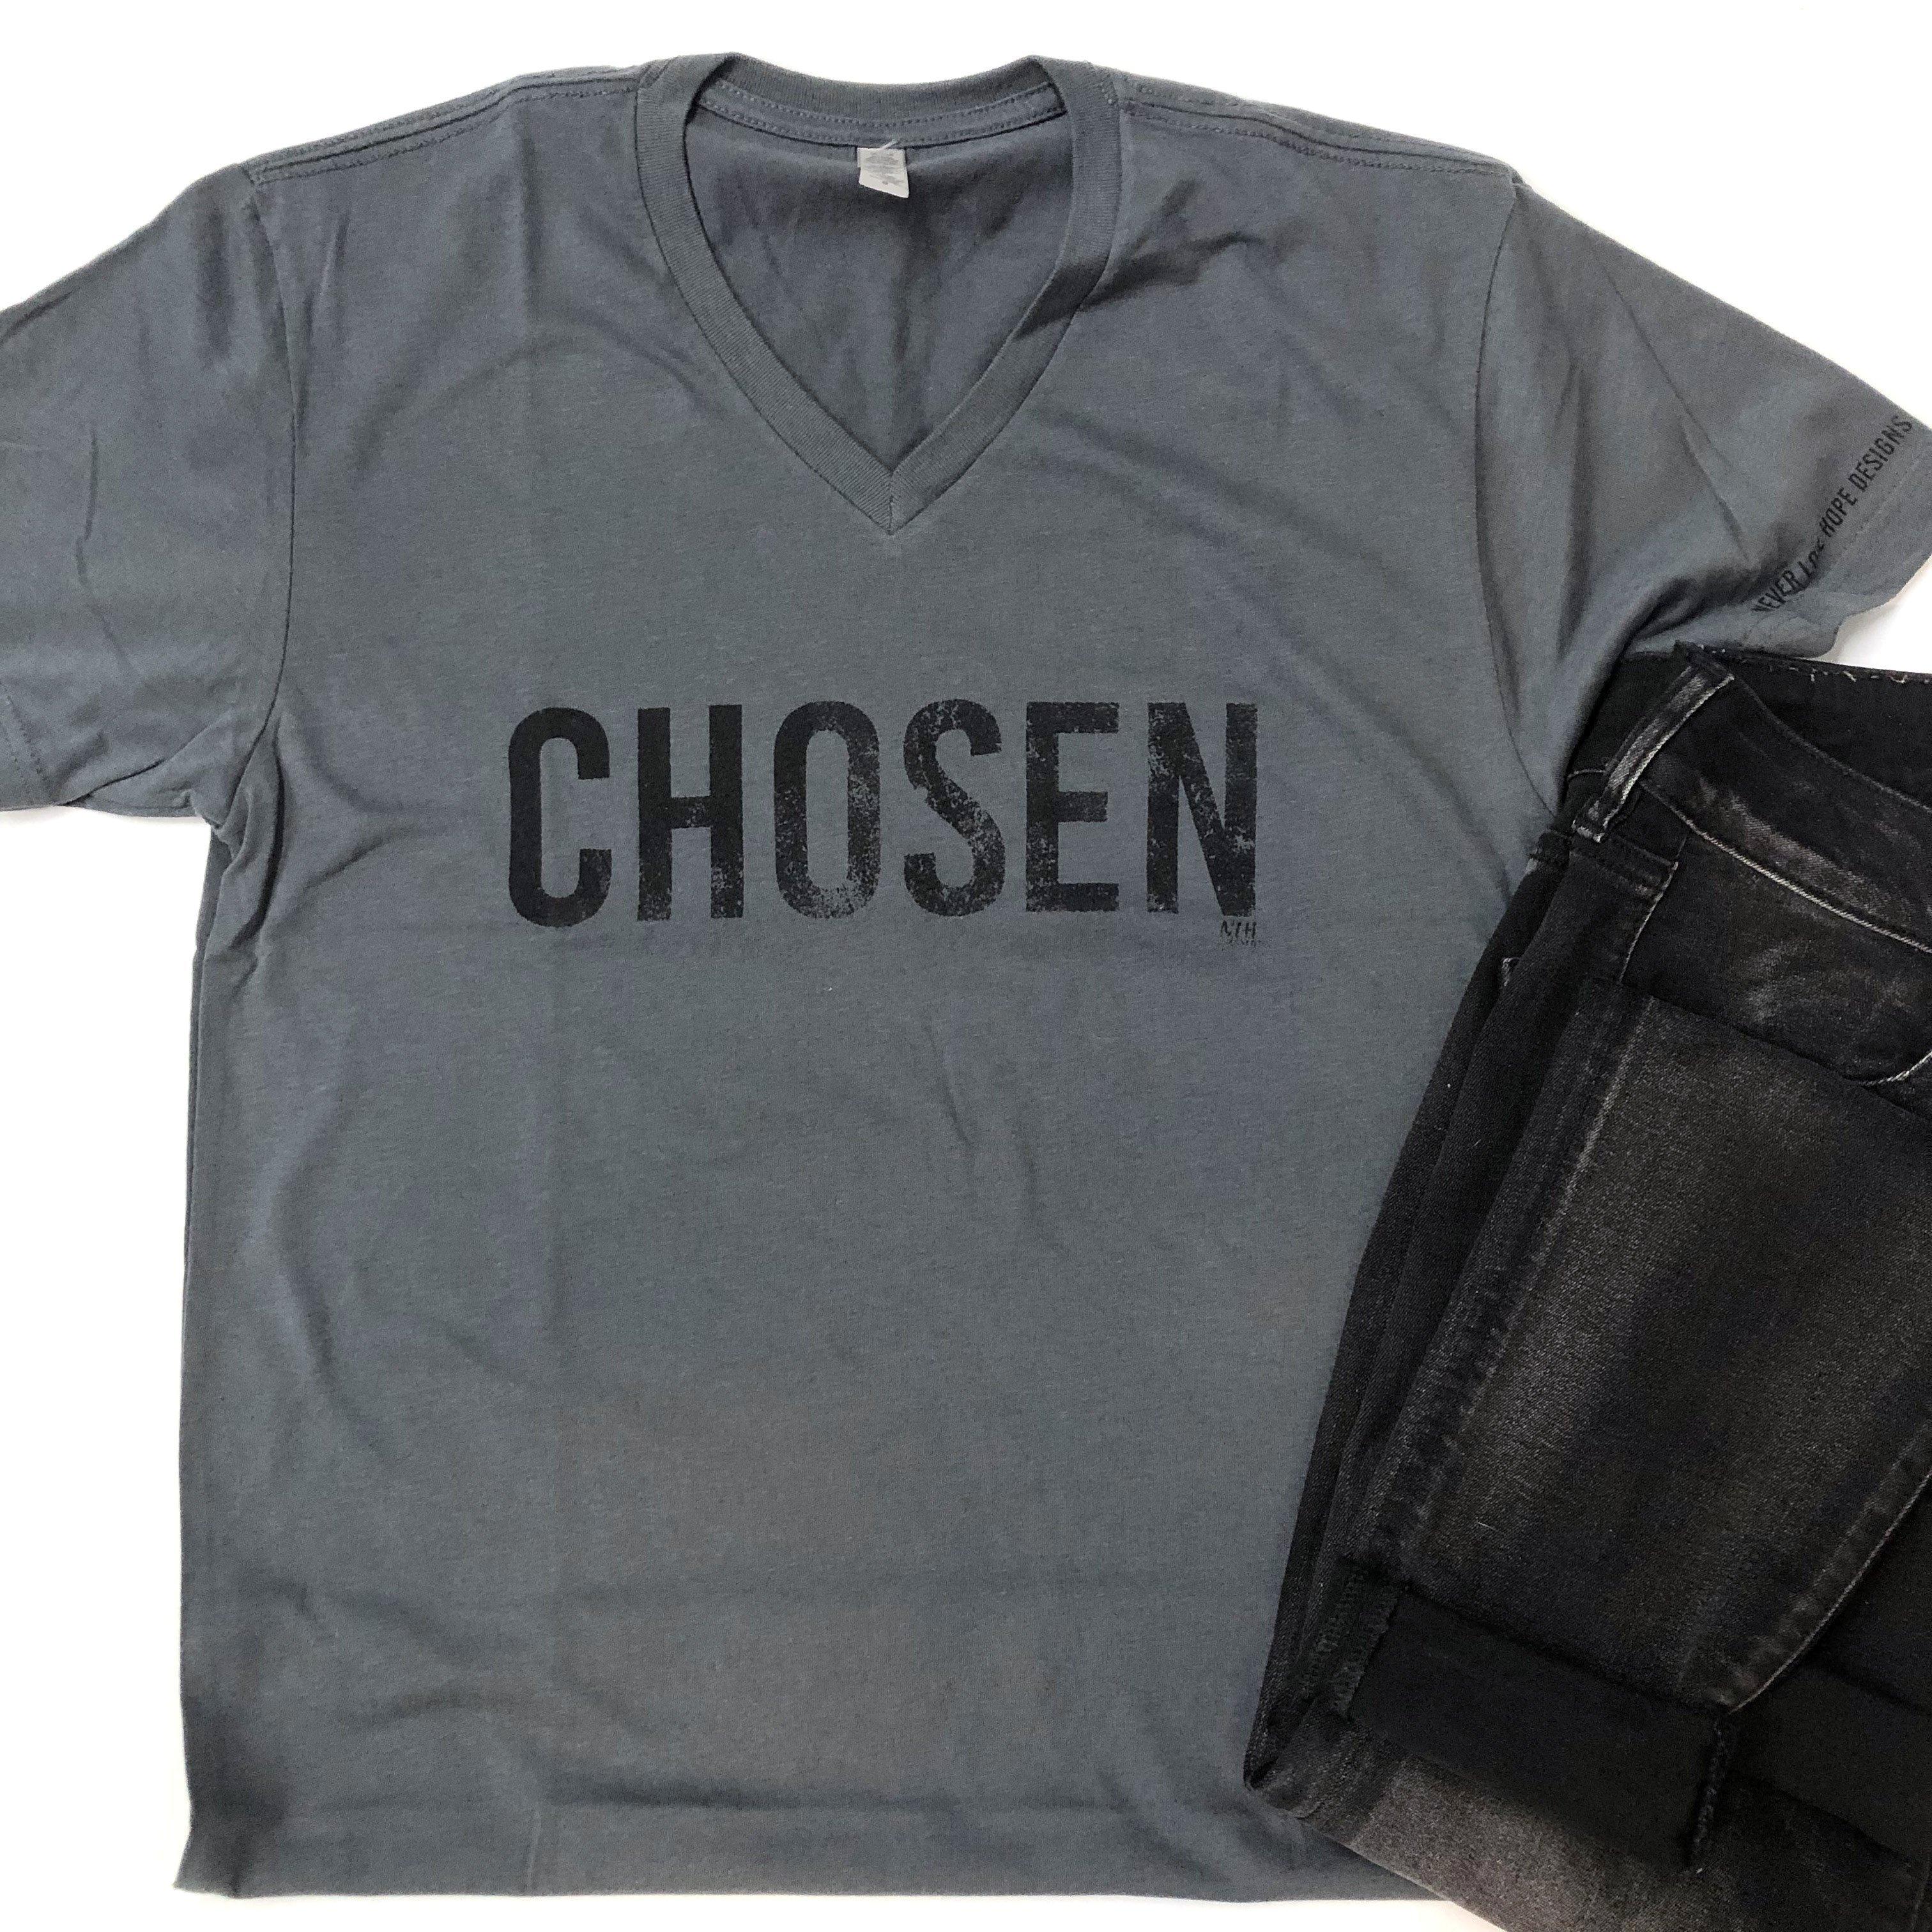 CHOSEN Short Sleeve T Shirt Gray | Sleeves, Shirts, T shirt